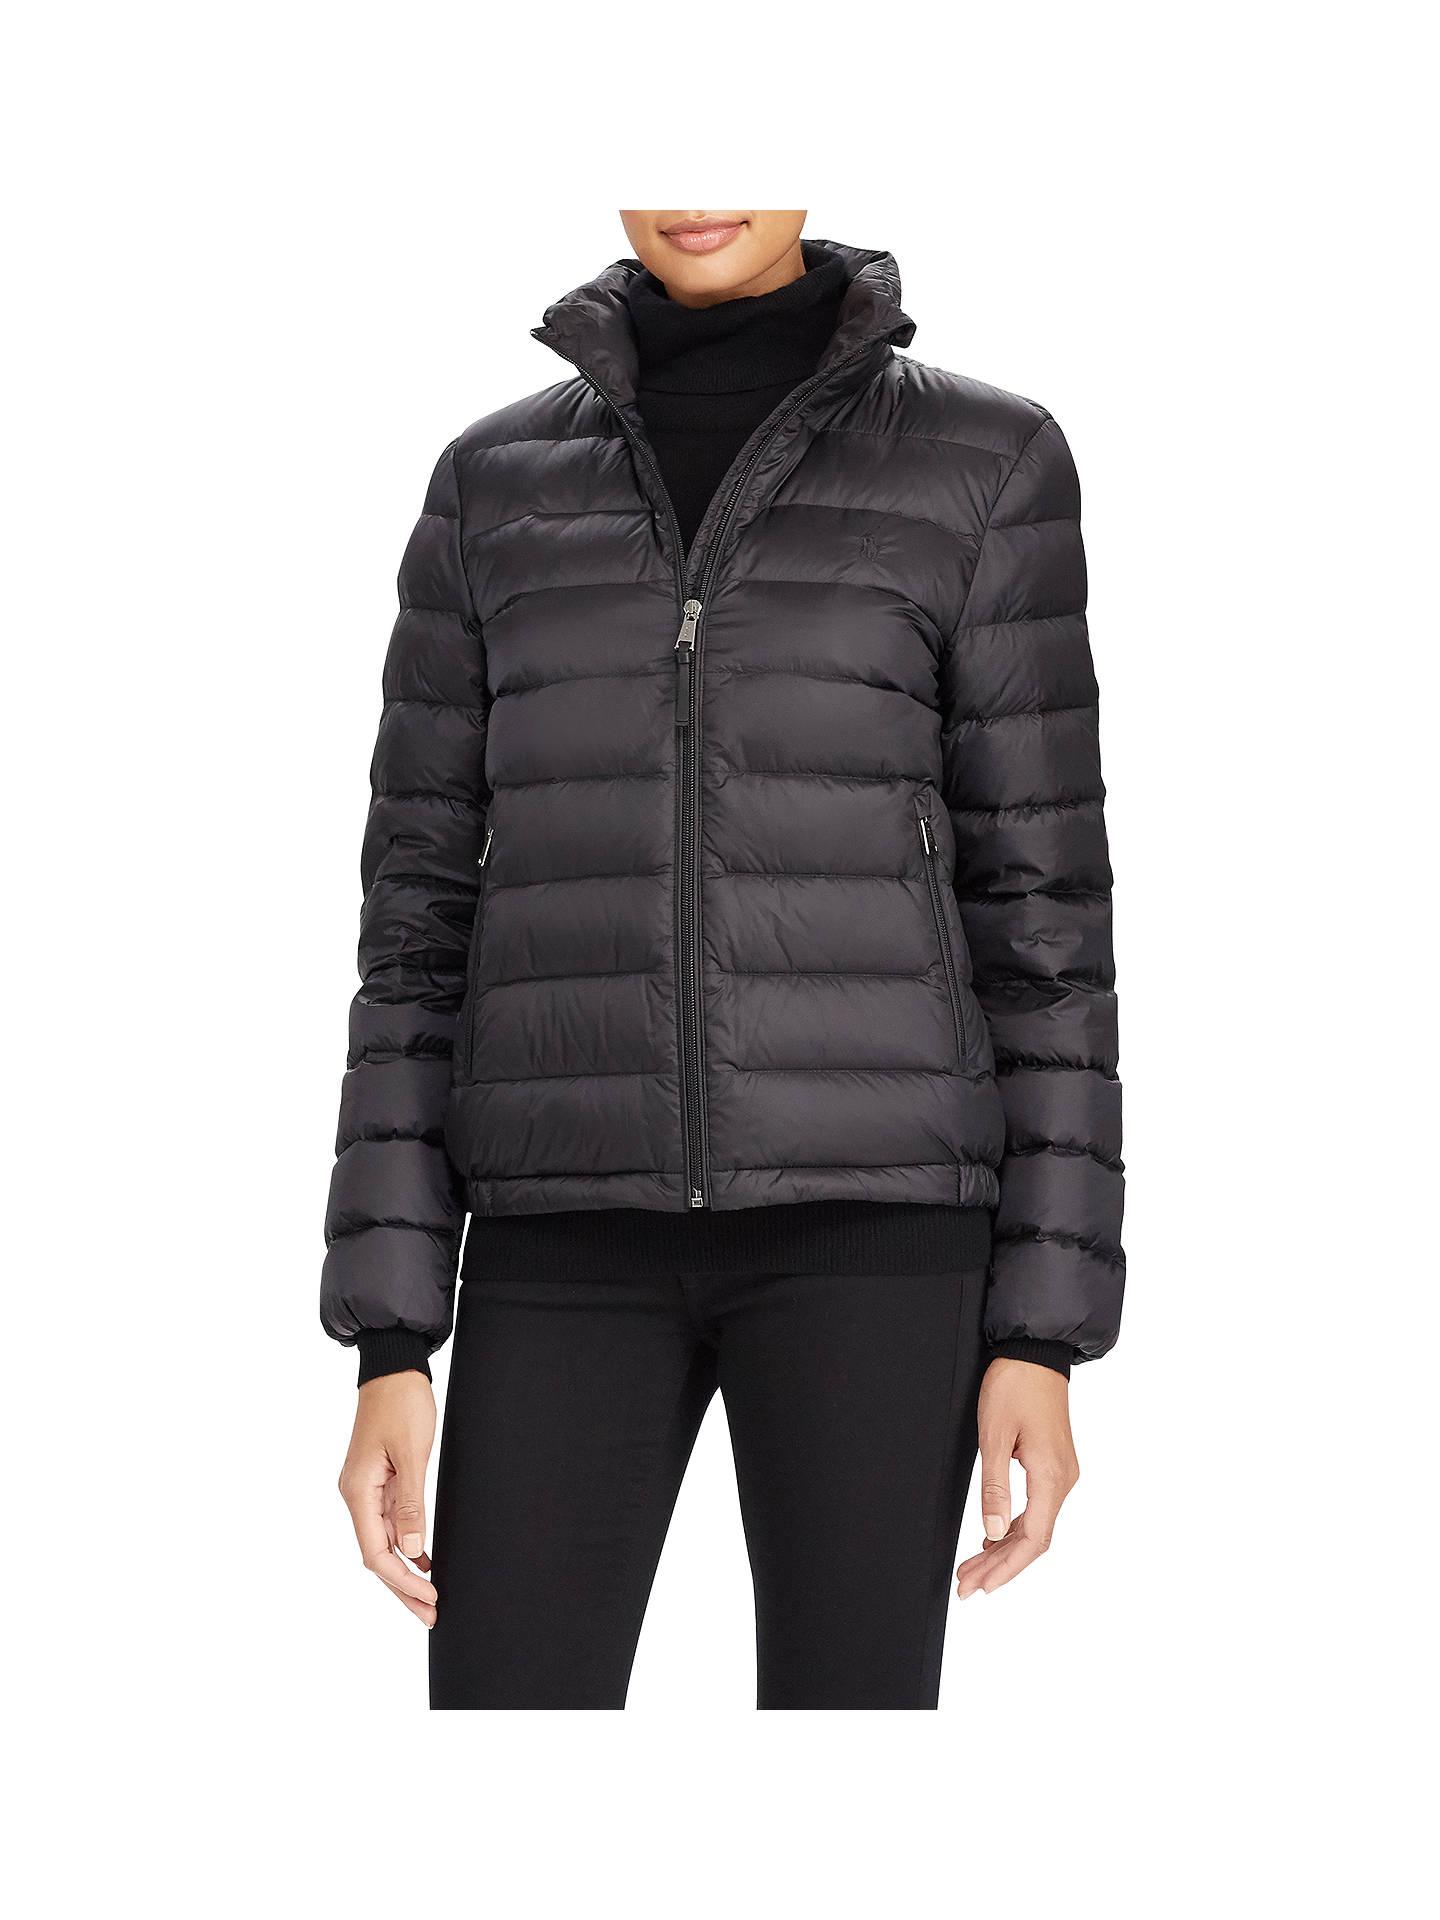 652ff51348f7 Buy Polo Ralph Lauren Lightweight Down Jacket